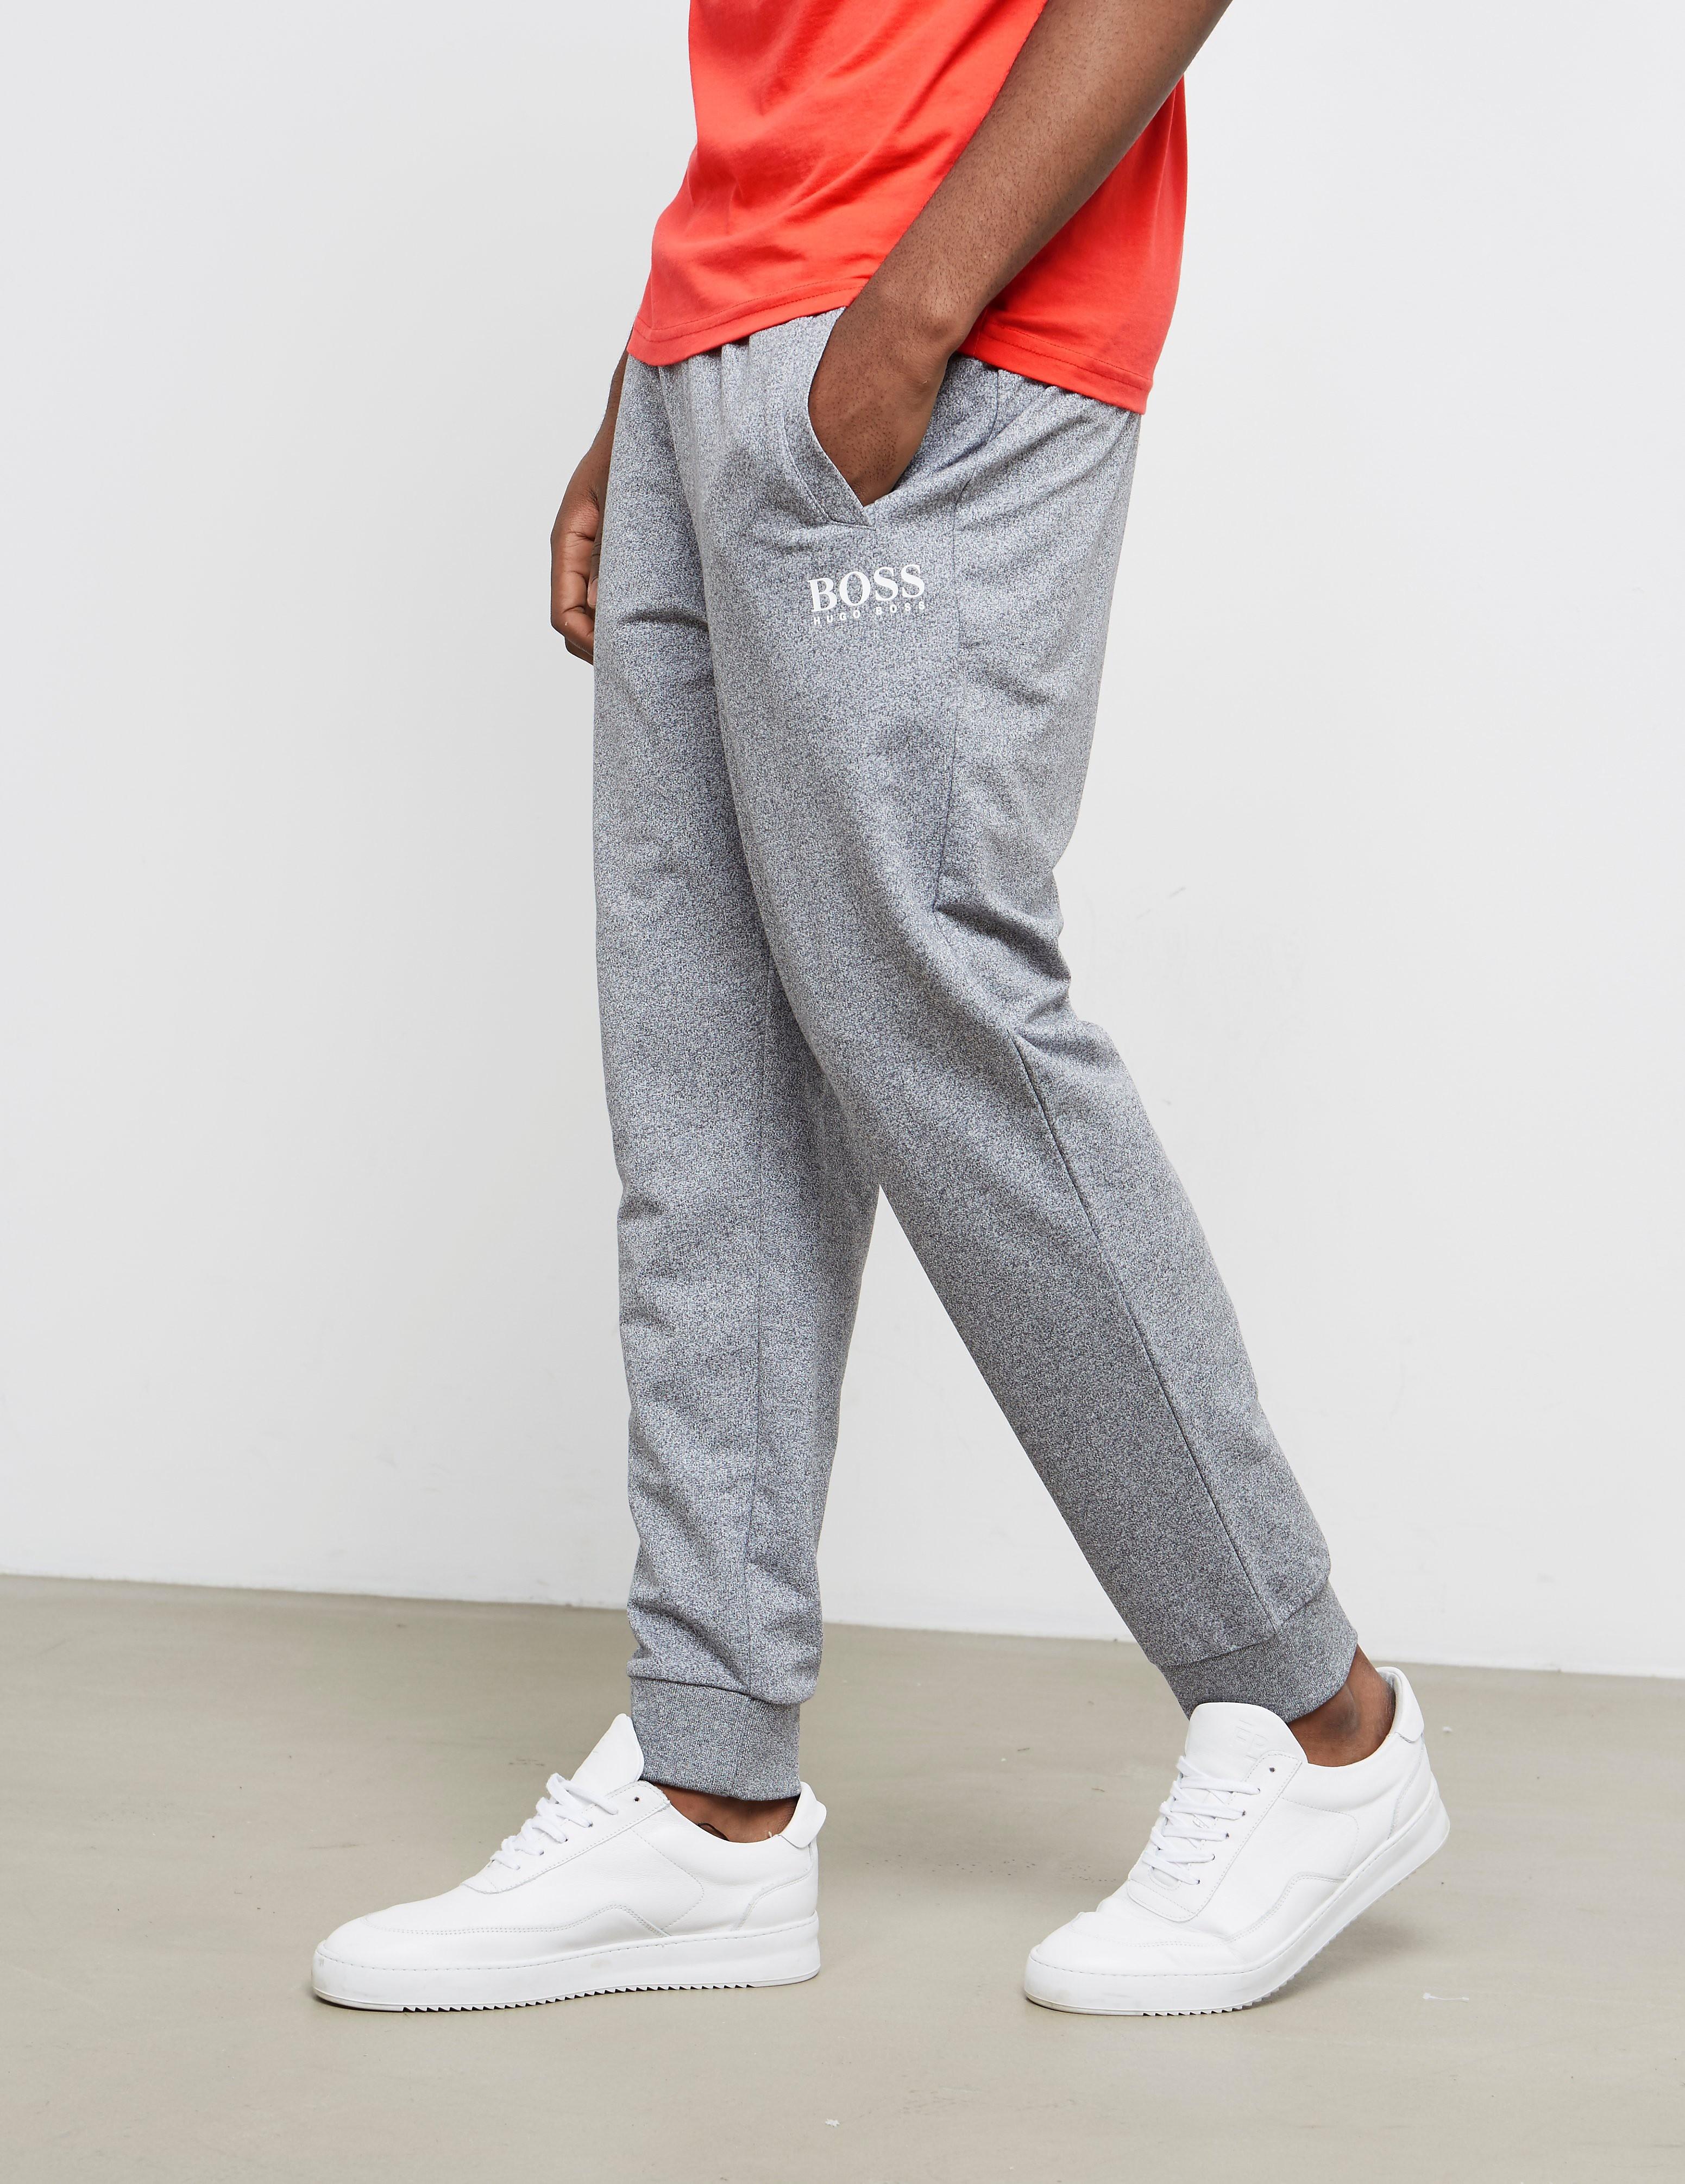 BOSS Heritage Cuff Fleece Pants